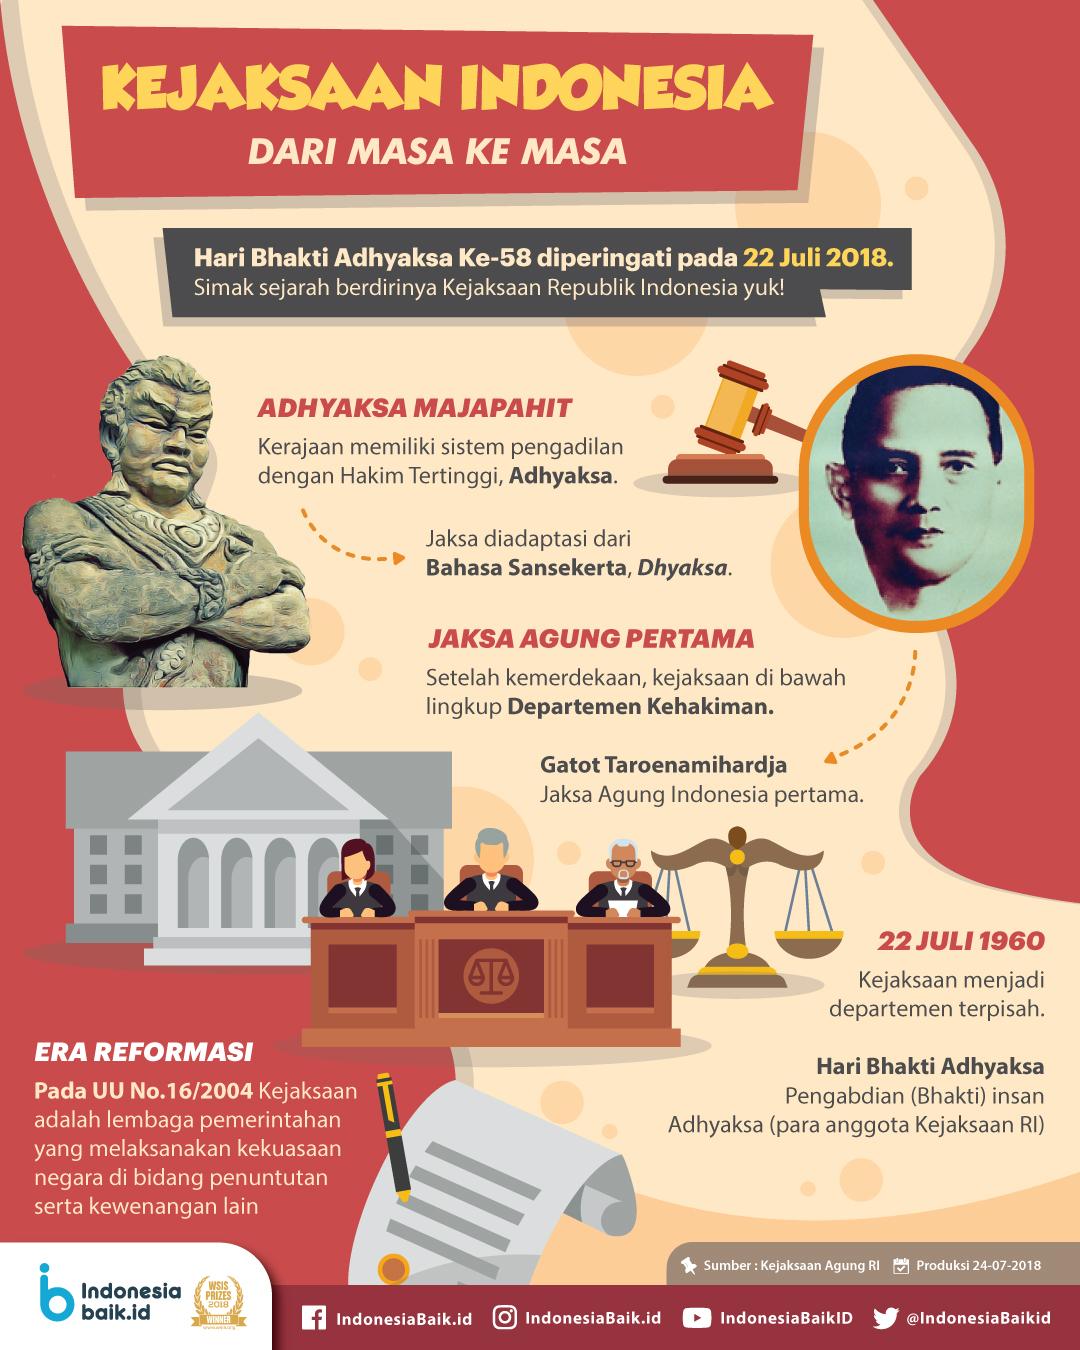 Kejaksaan Indonesia Dari Masa Ke Masa